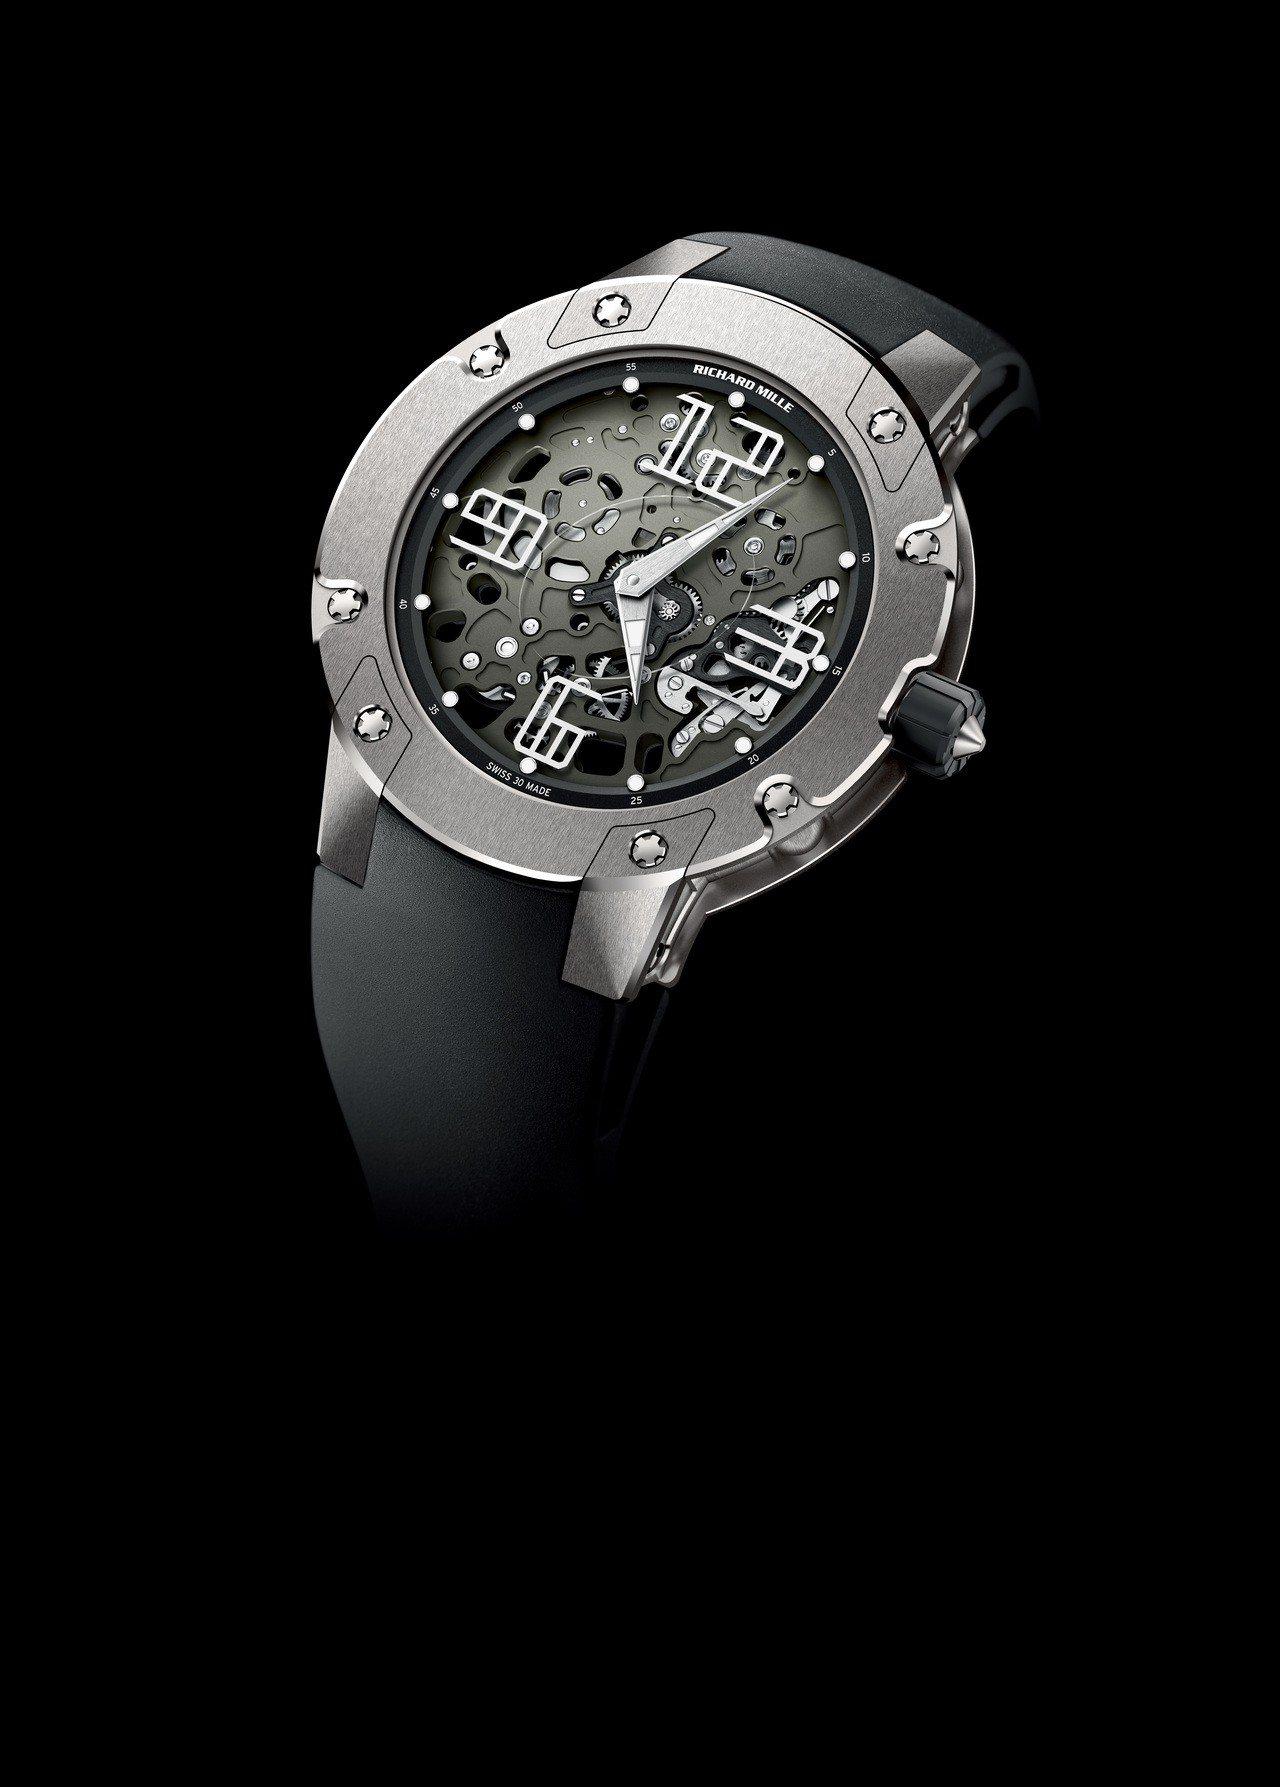 RICHARD MILLE RM033超薄腕表,钛合金表壳,搭载镂空RMXP1自...